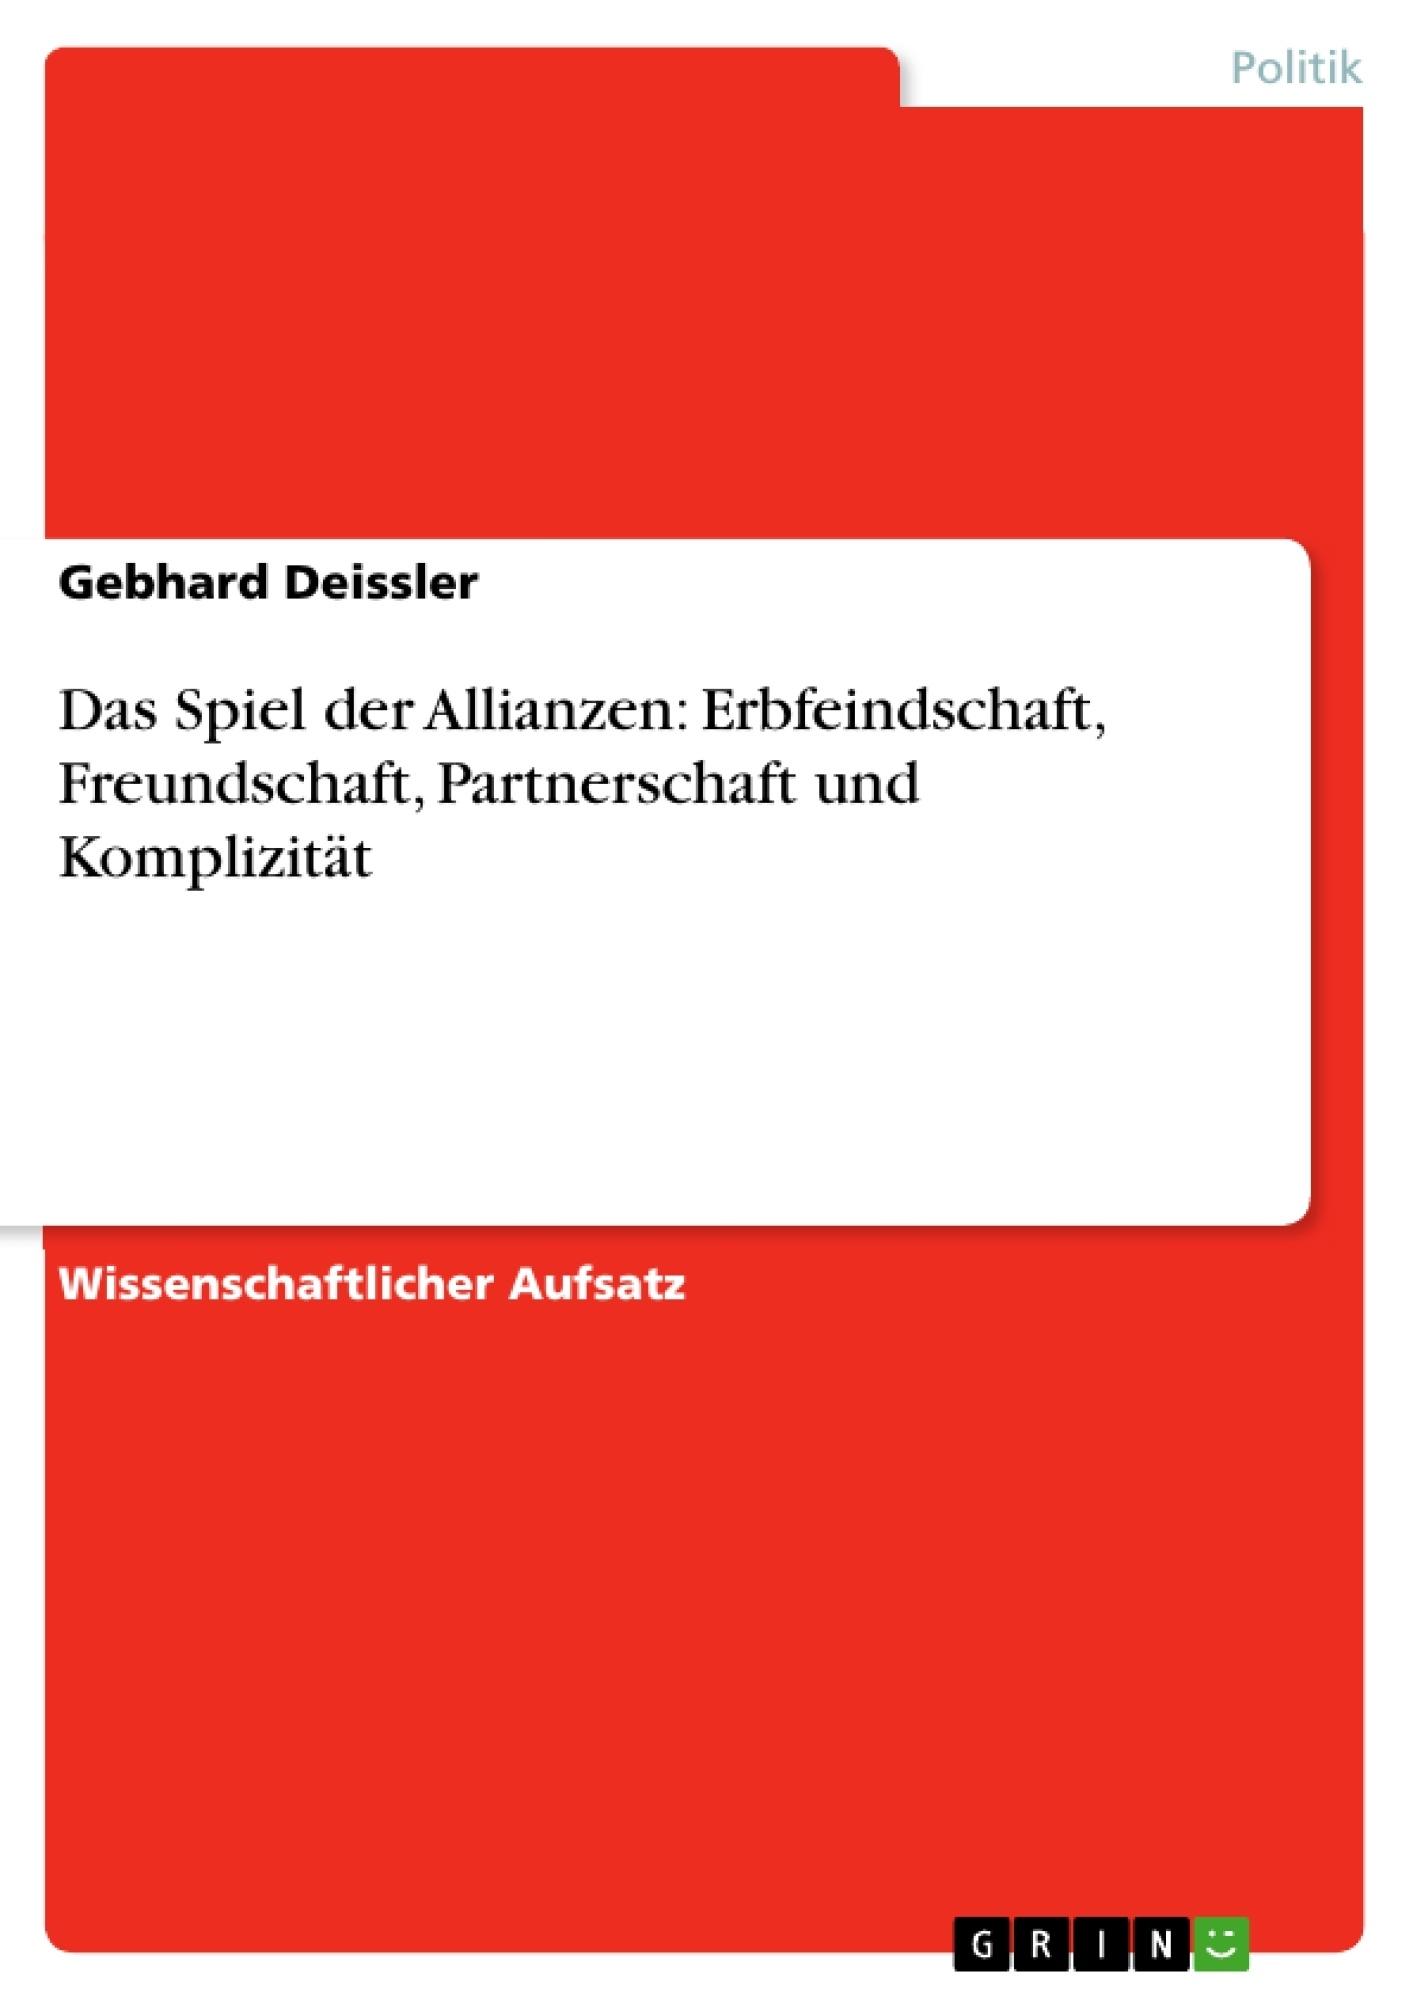 Titel: Das Spiel der Allianzen: Erbfeindschaft, Freundschaft, Partnerschaft und Komplizität